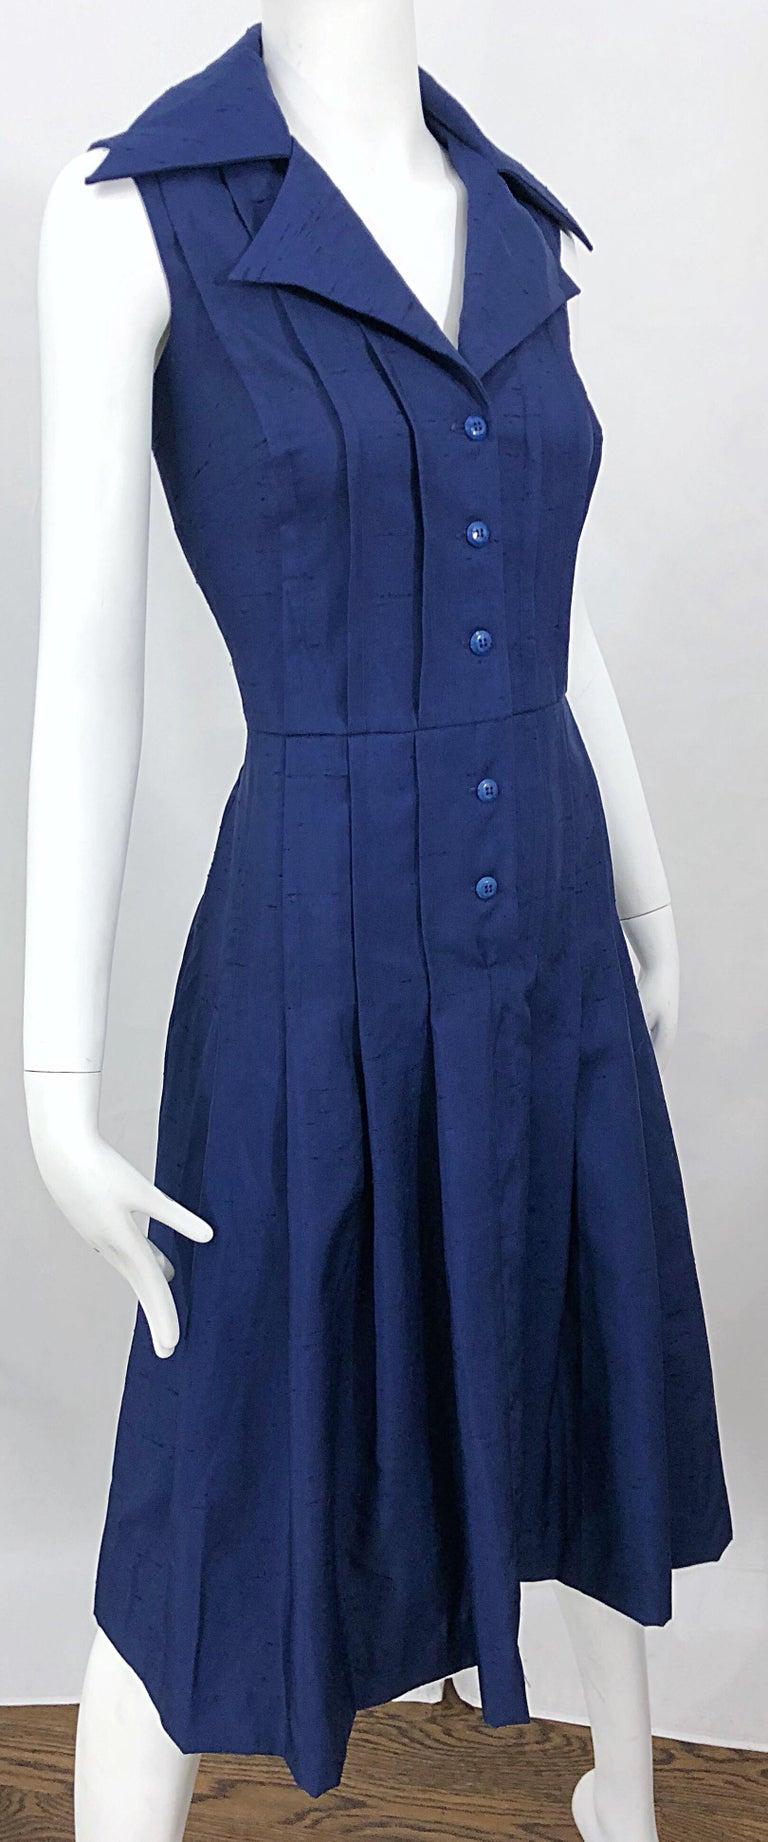 1990s Saks 5th Avenue Size 10 Navy Blue Silk Vintage 90s Sleeveless Shirt Dress For Sale 1